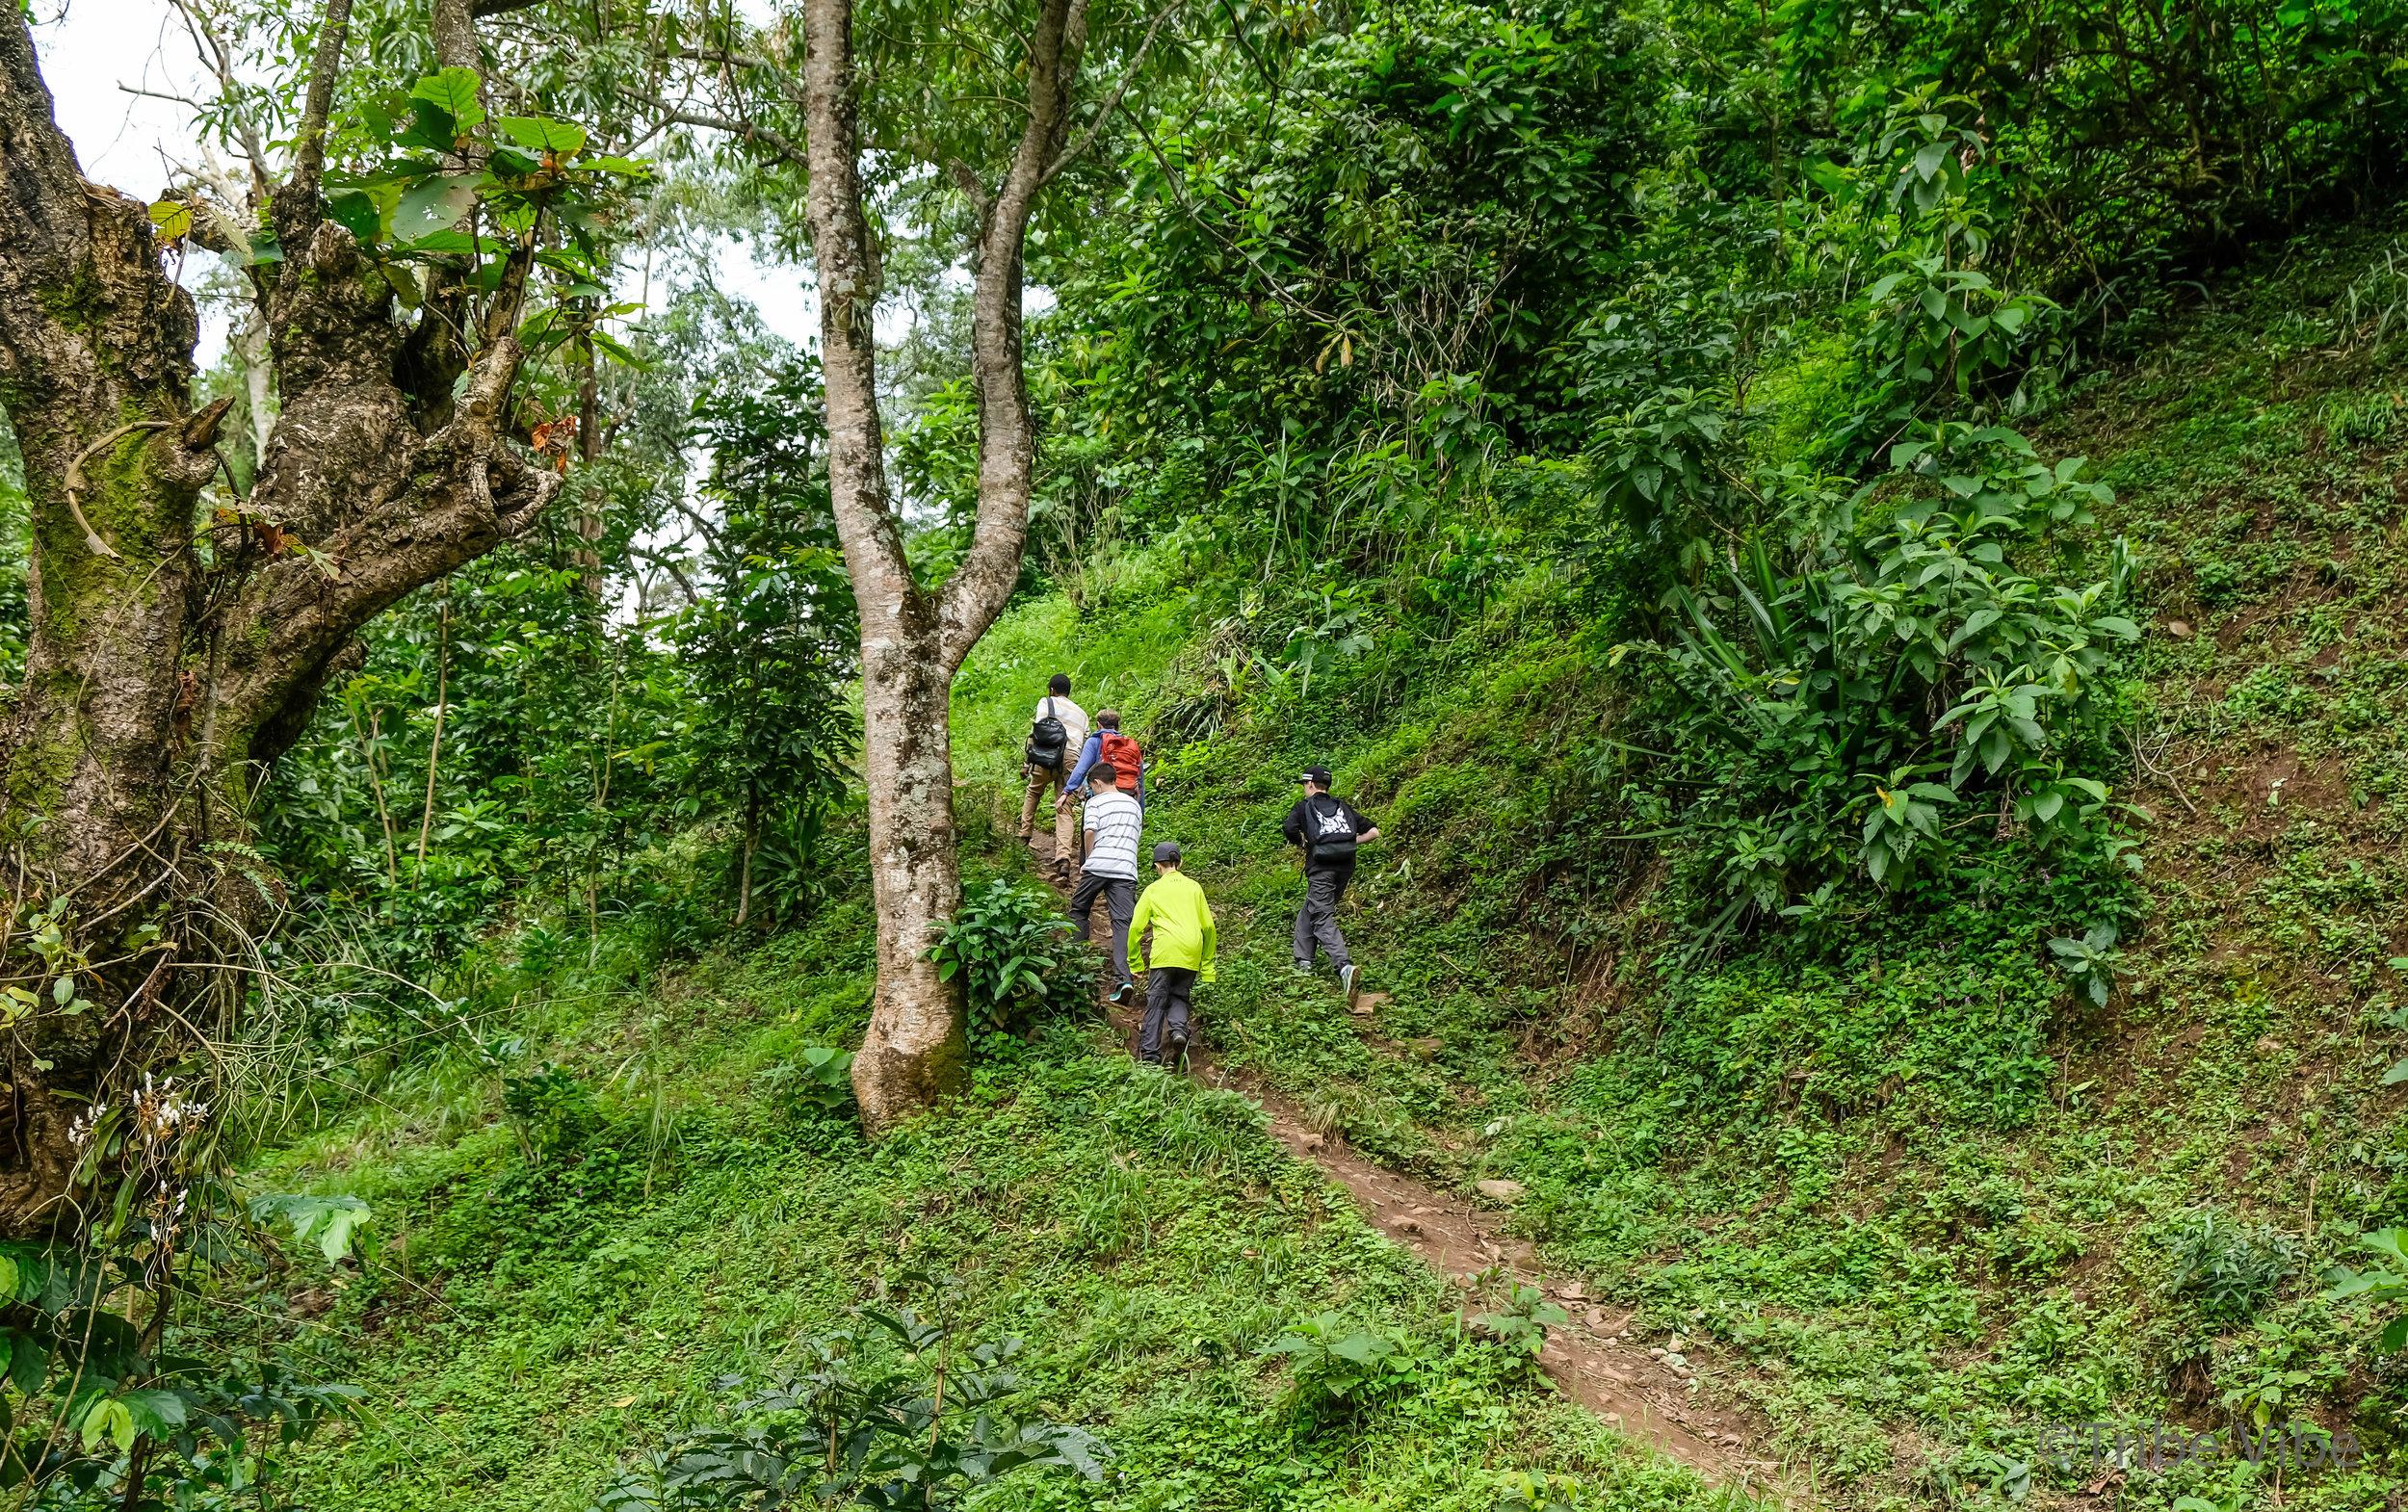 Machame walking trail to the bridge 7, Kilimanjaro.jpg